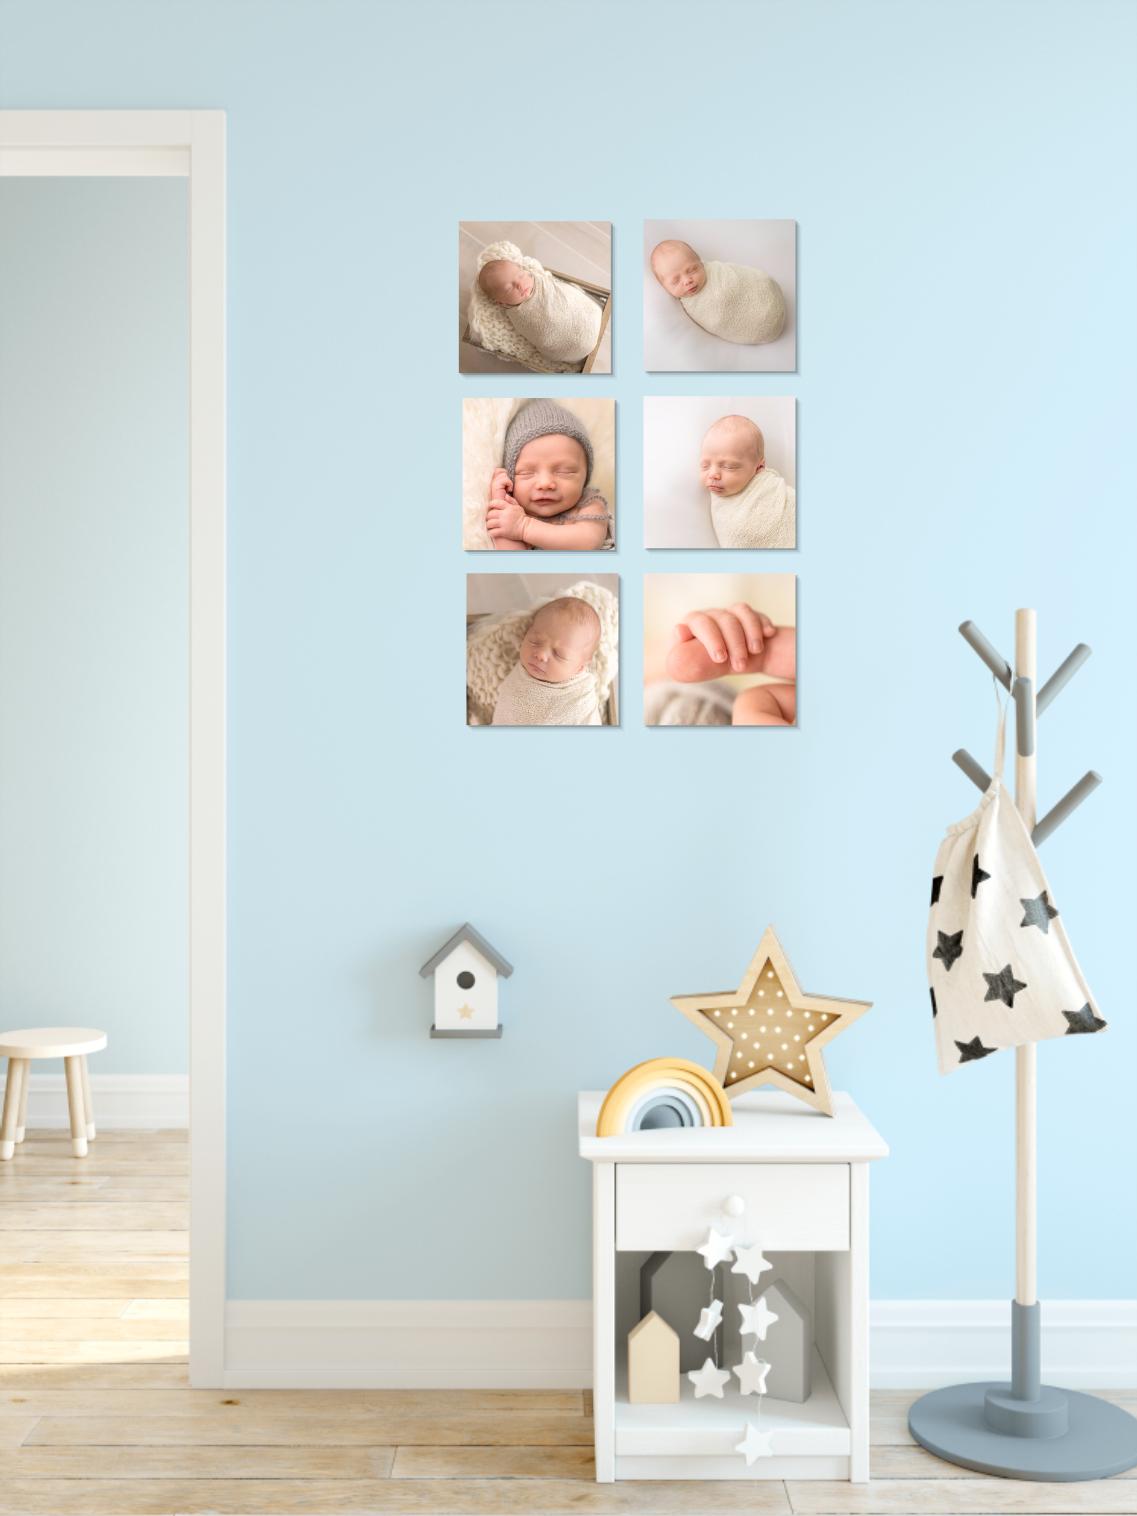 newborn wall gallery.png